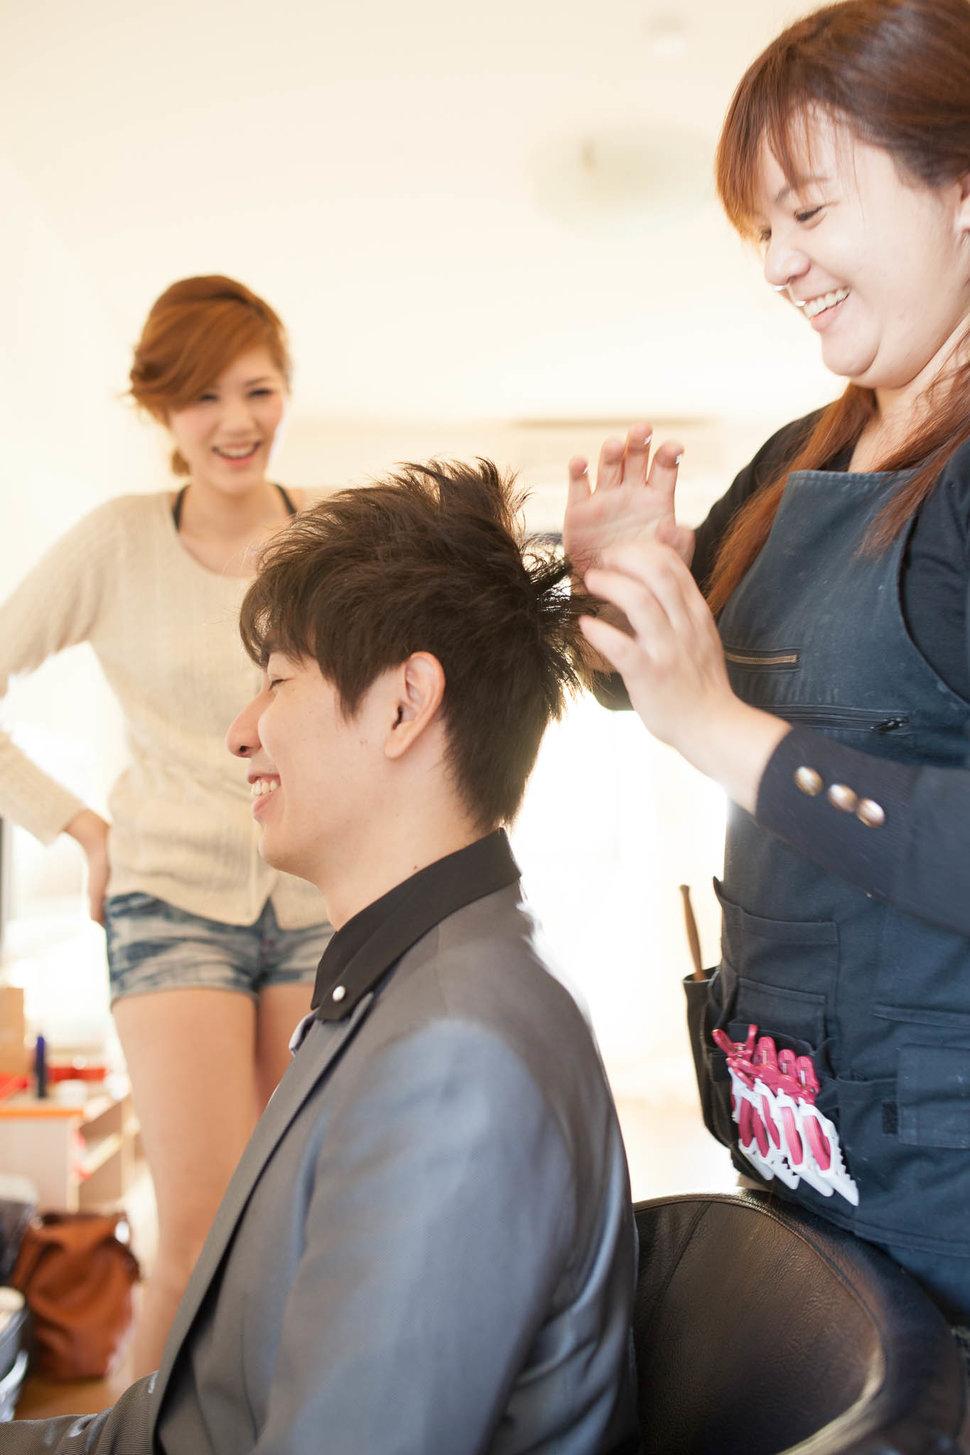 18PHOTO-大育❤️ 小汝(花園婚禮)(編號:225986) - 18PHOTO 婚紗影像攝影工作室 - 結婚吧一站式婚禮服務平台